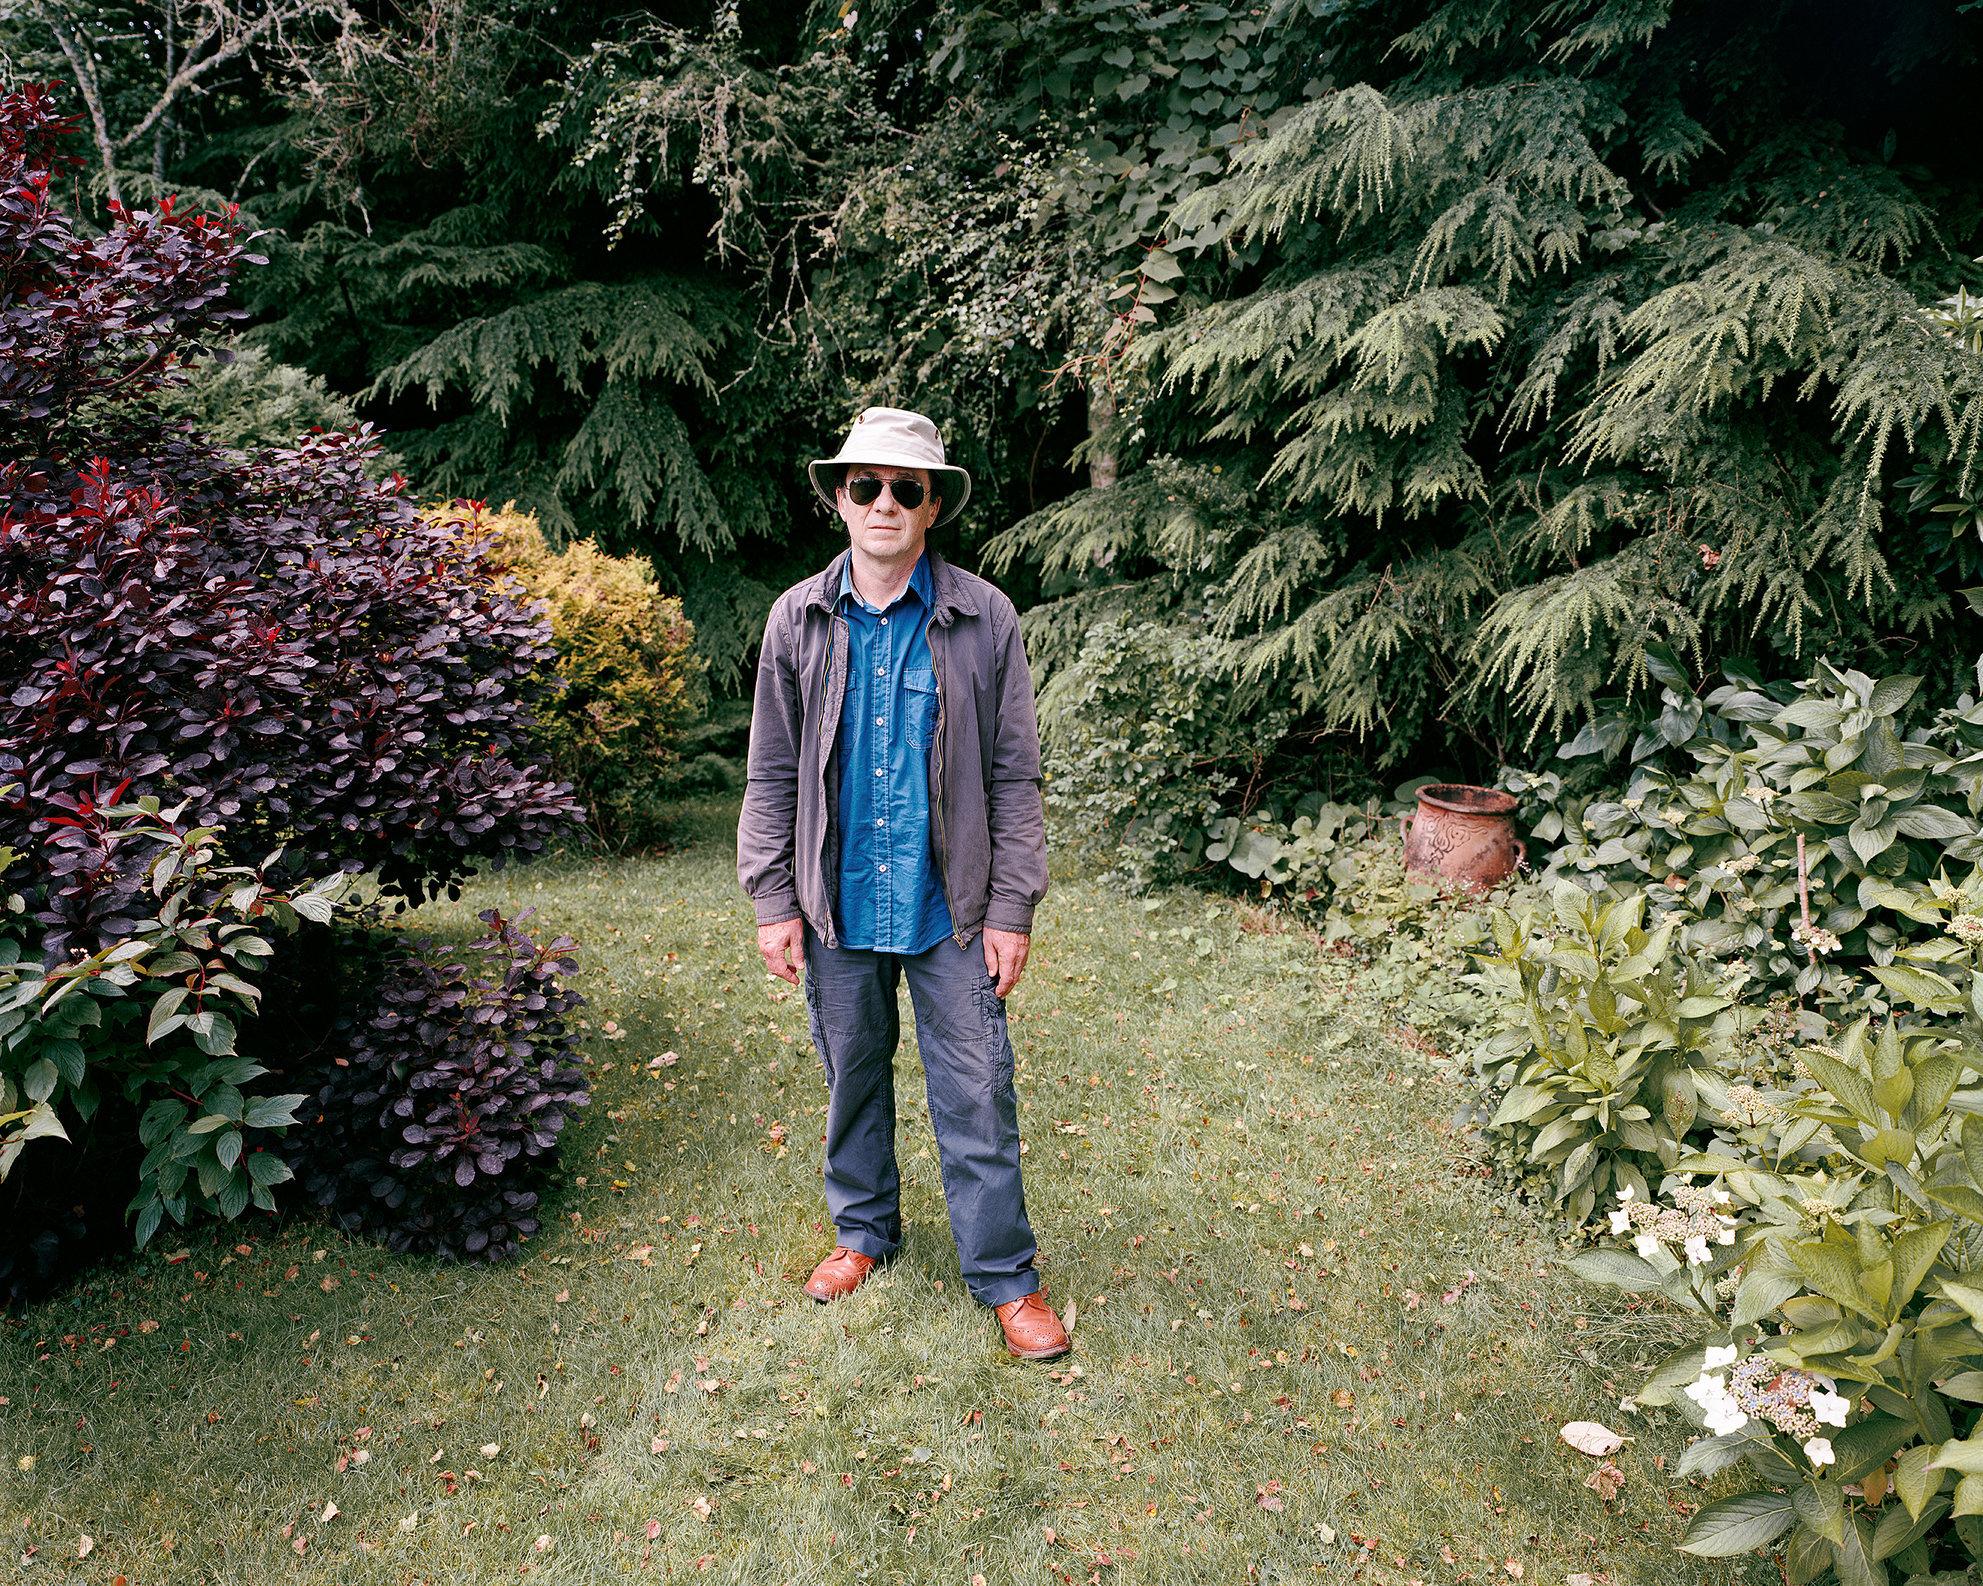 Steve Miller. Record Producer, Cornwall.